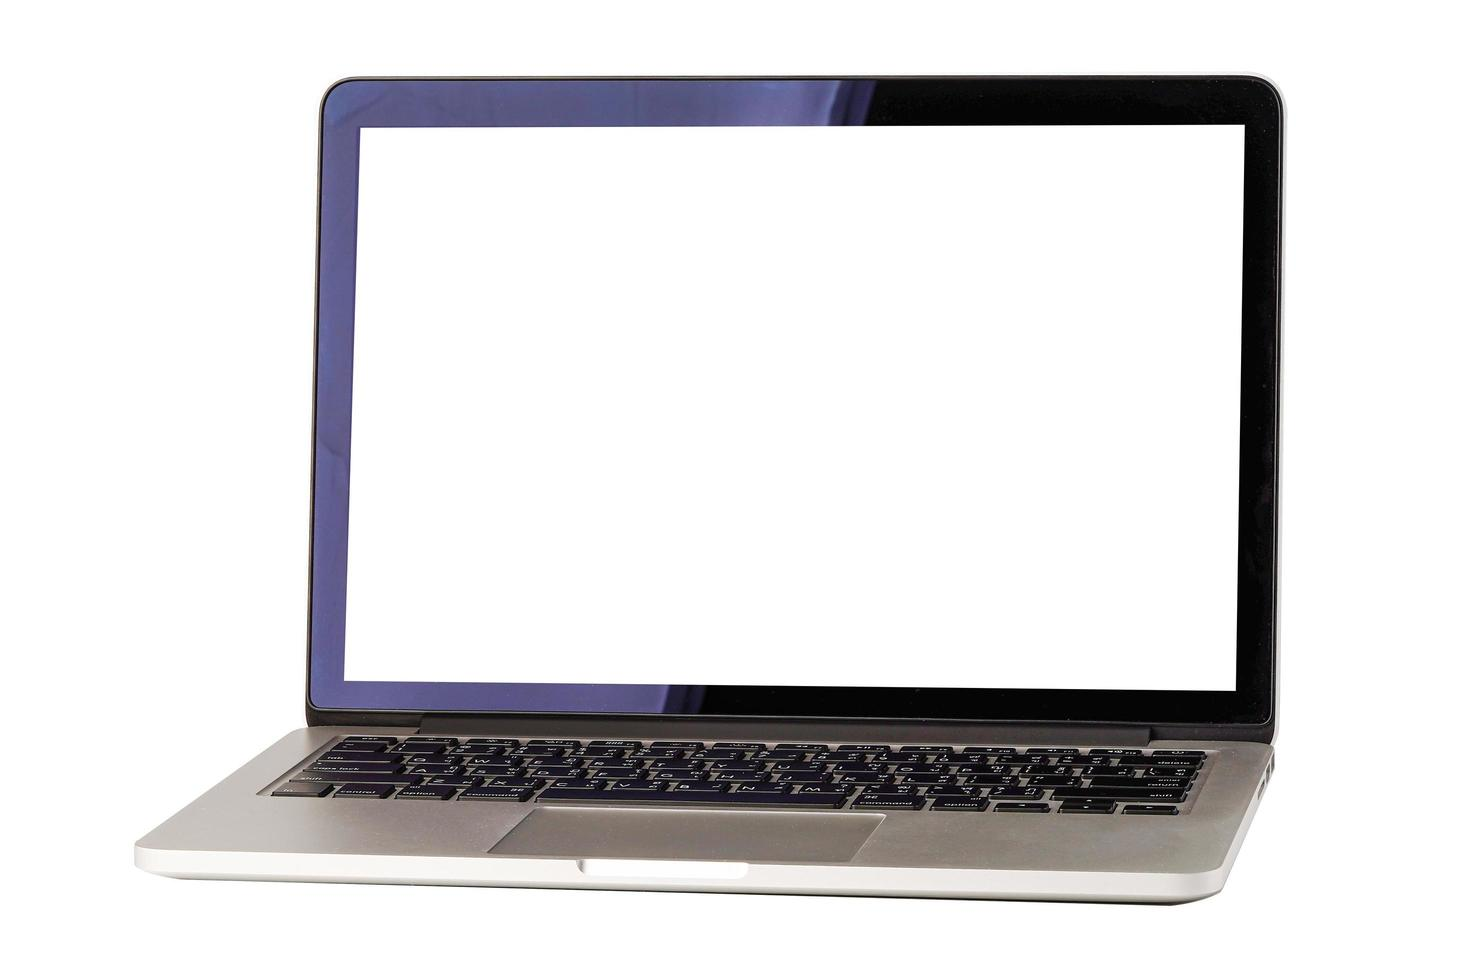 Tecnología portátil de computadora aislada sobre fondo blanco. foto